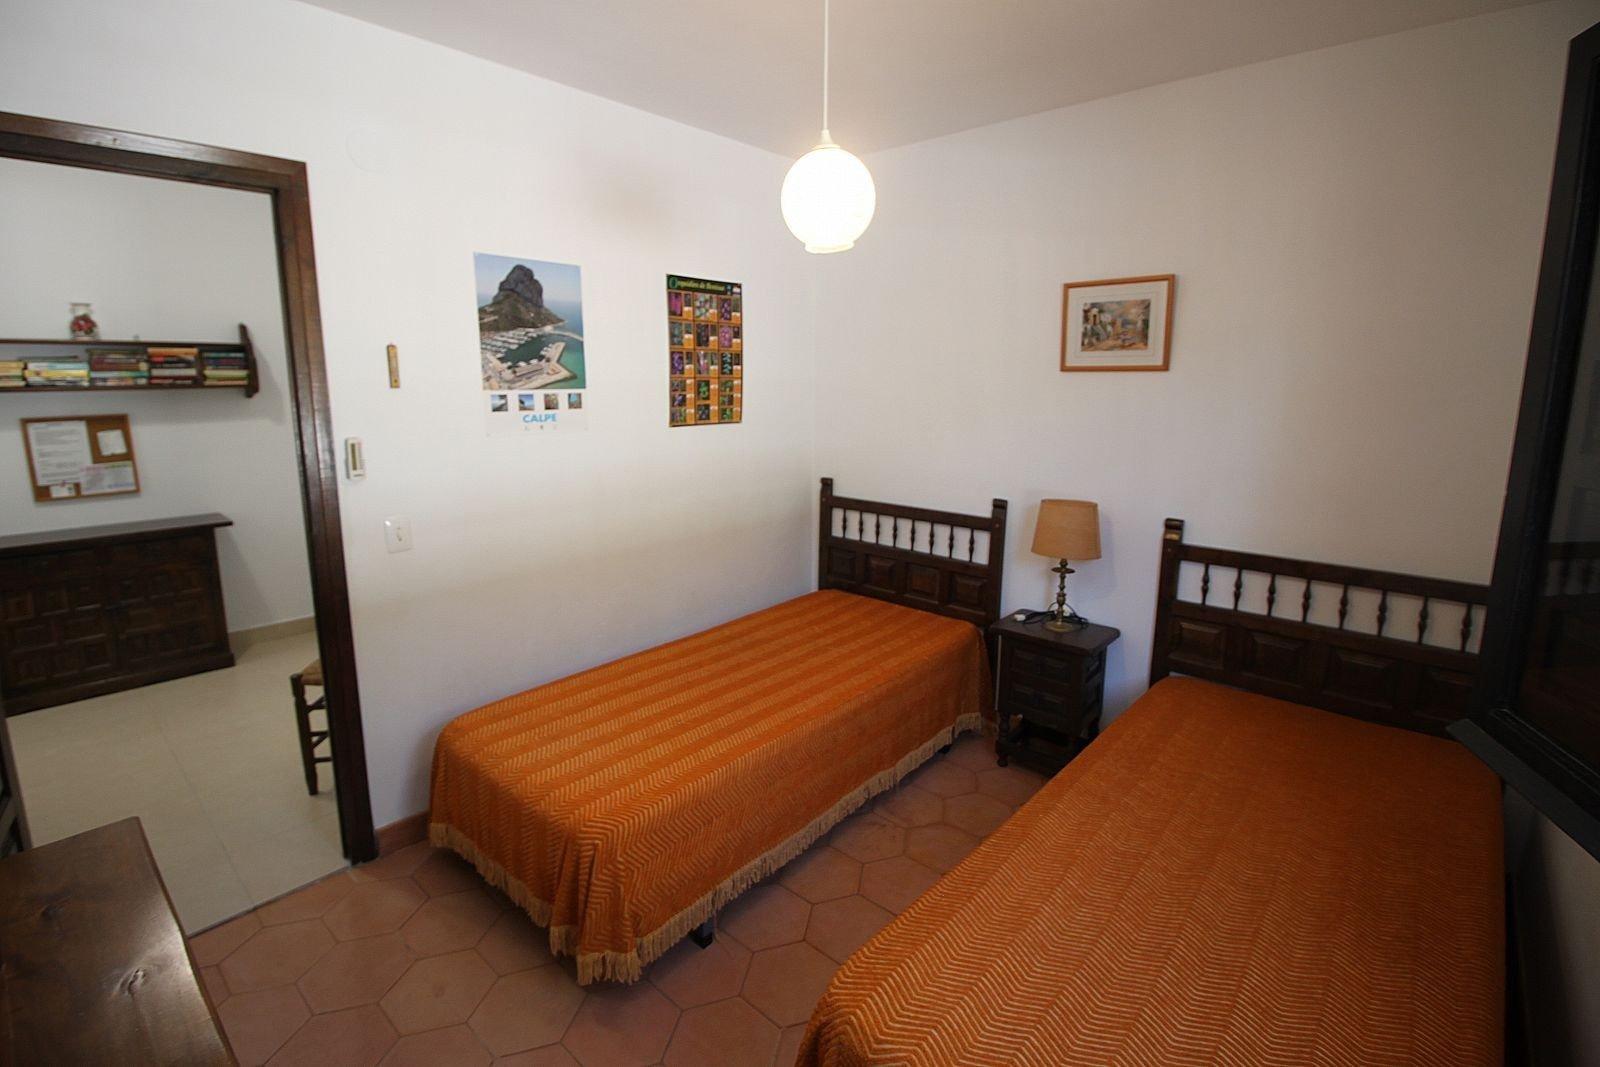 Villa in groene omgeving met veel privacy en rust